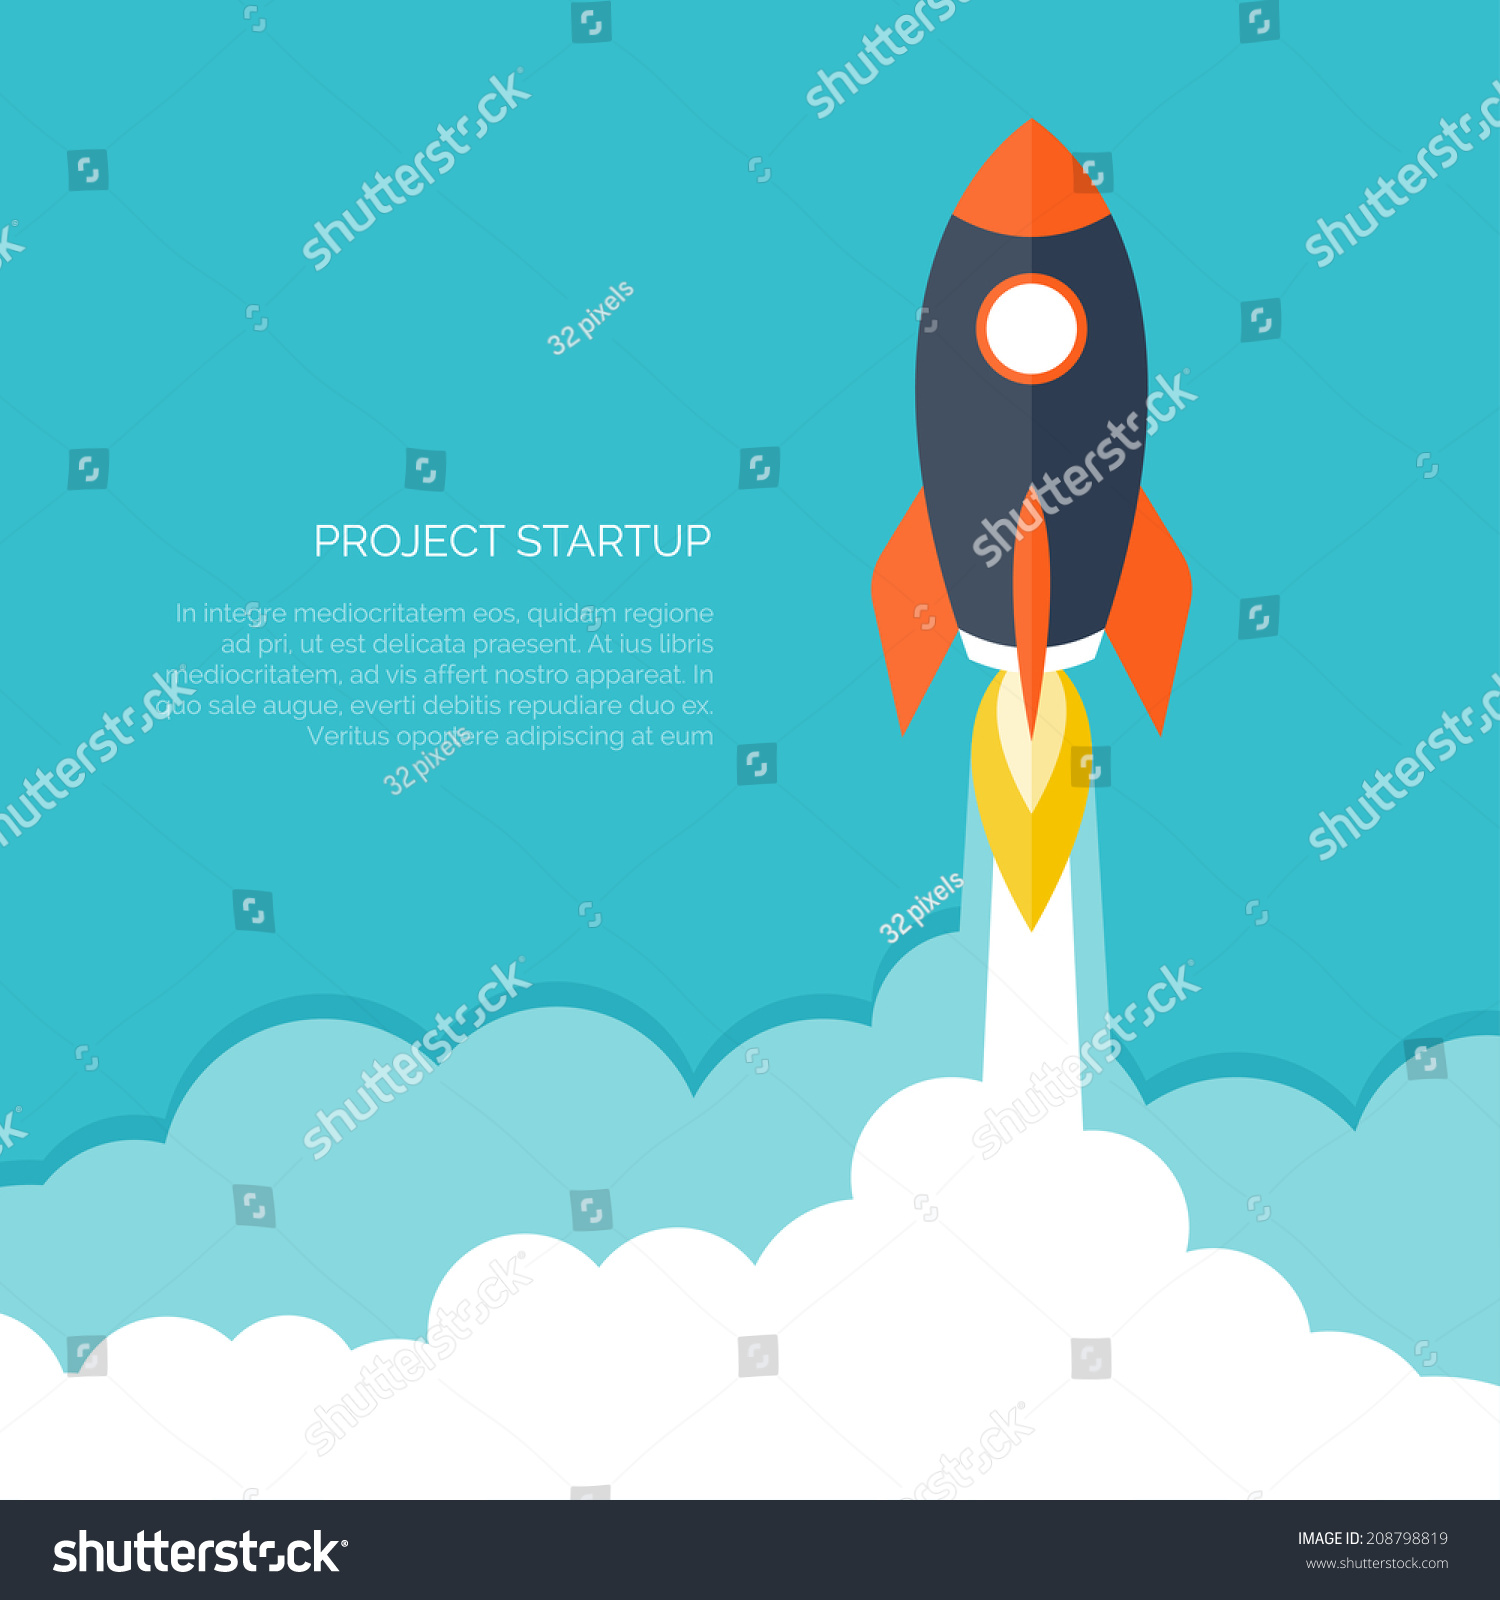 Rockets To The Moon: Rocket Ship Flat Stylevector Illustration 3d Stock Vector